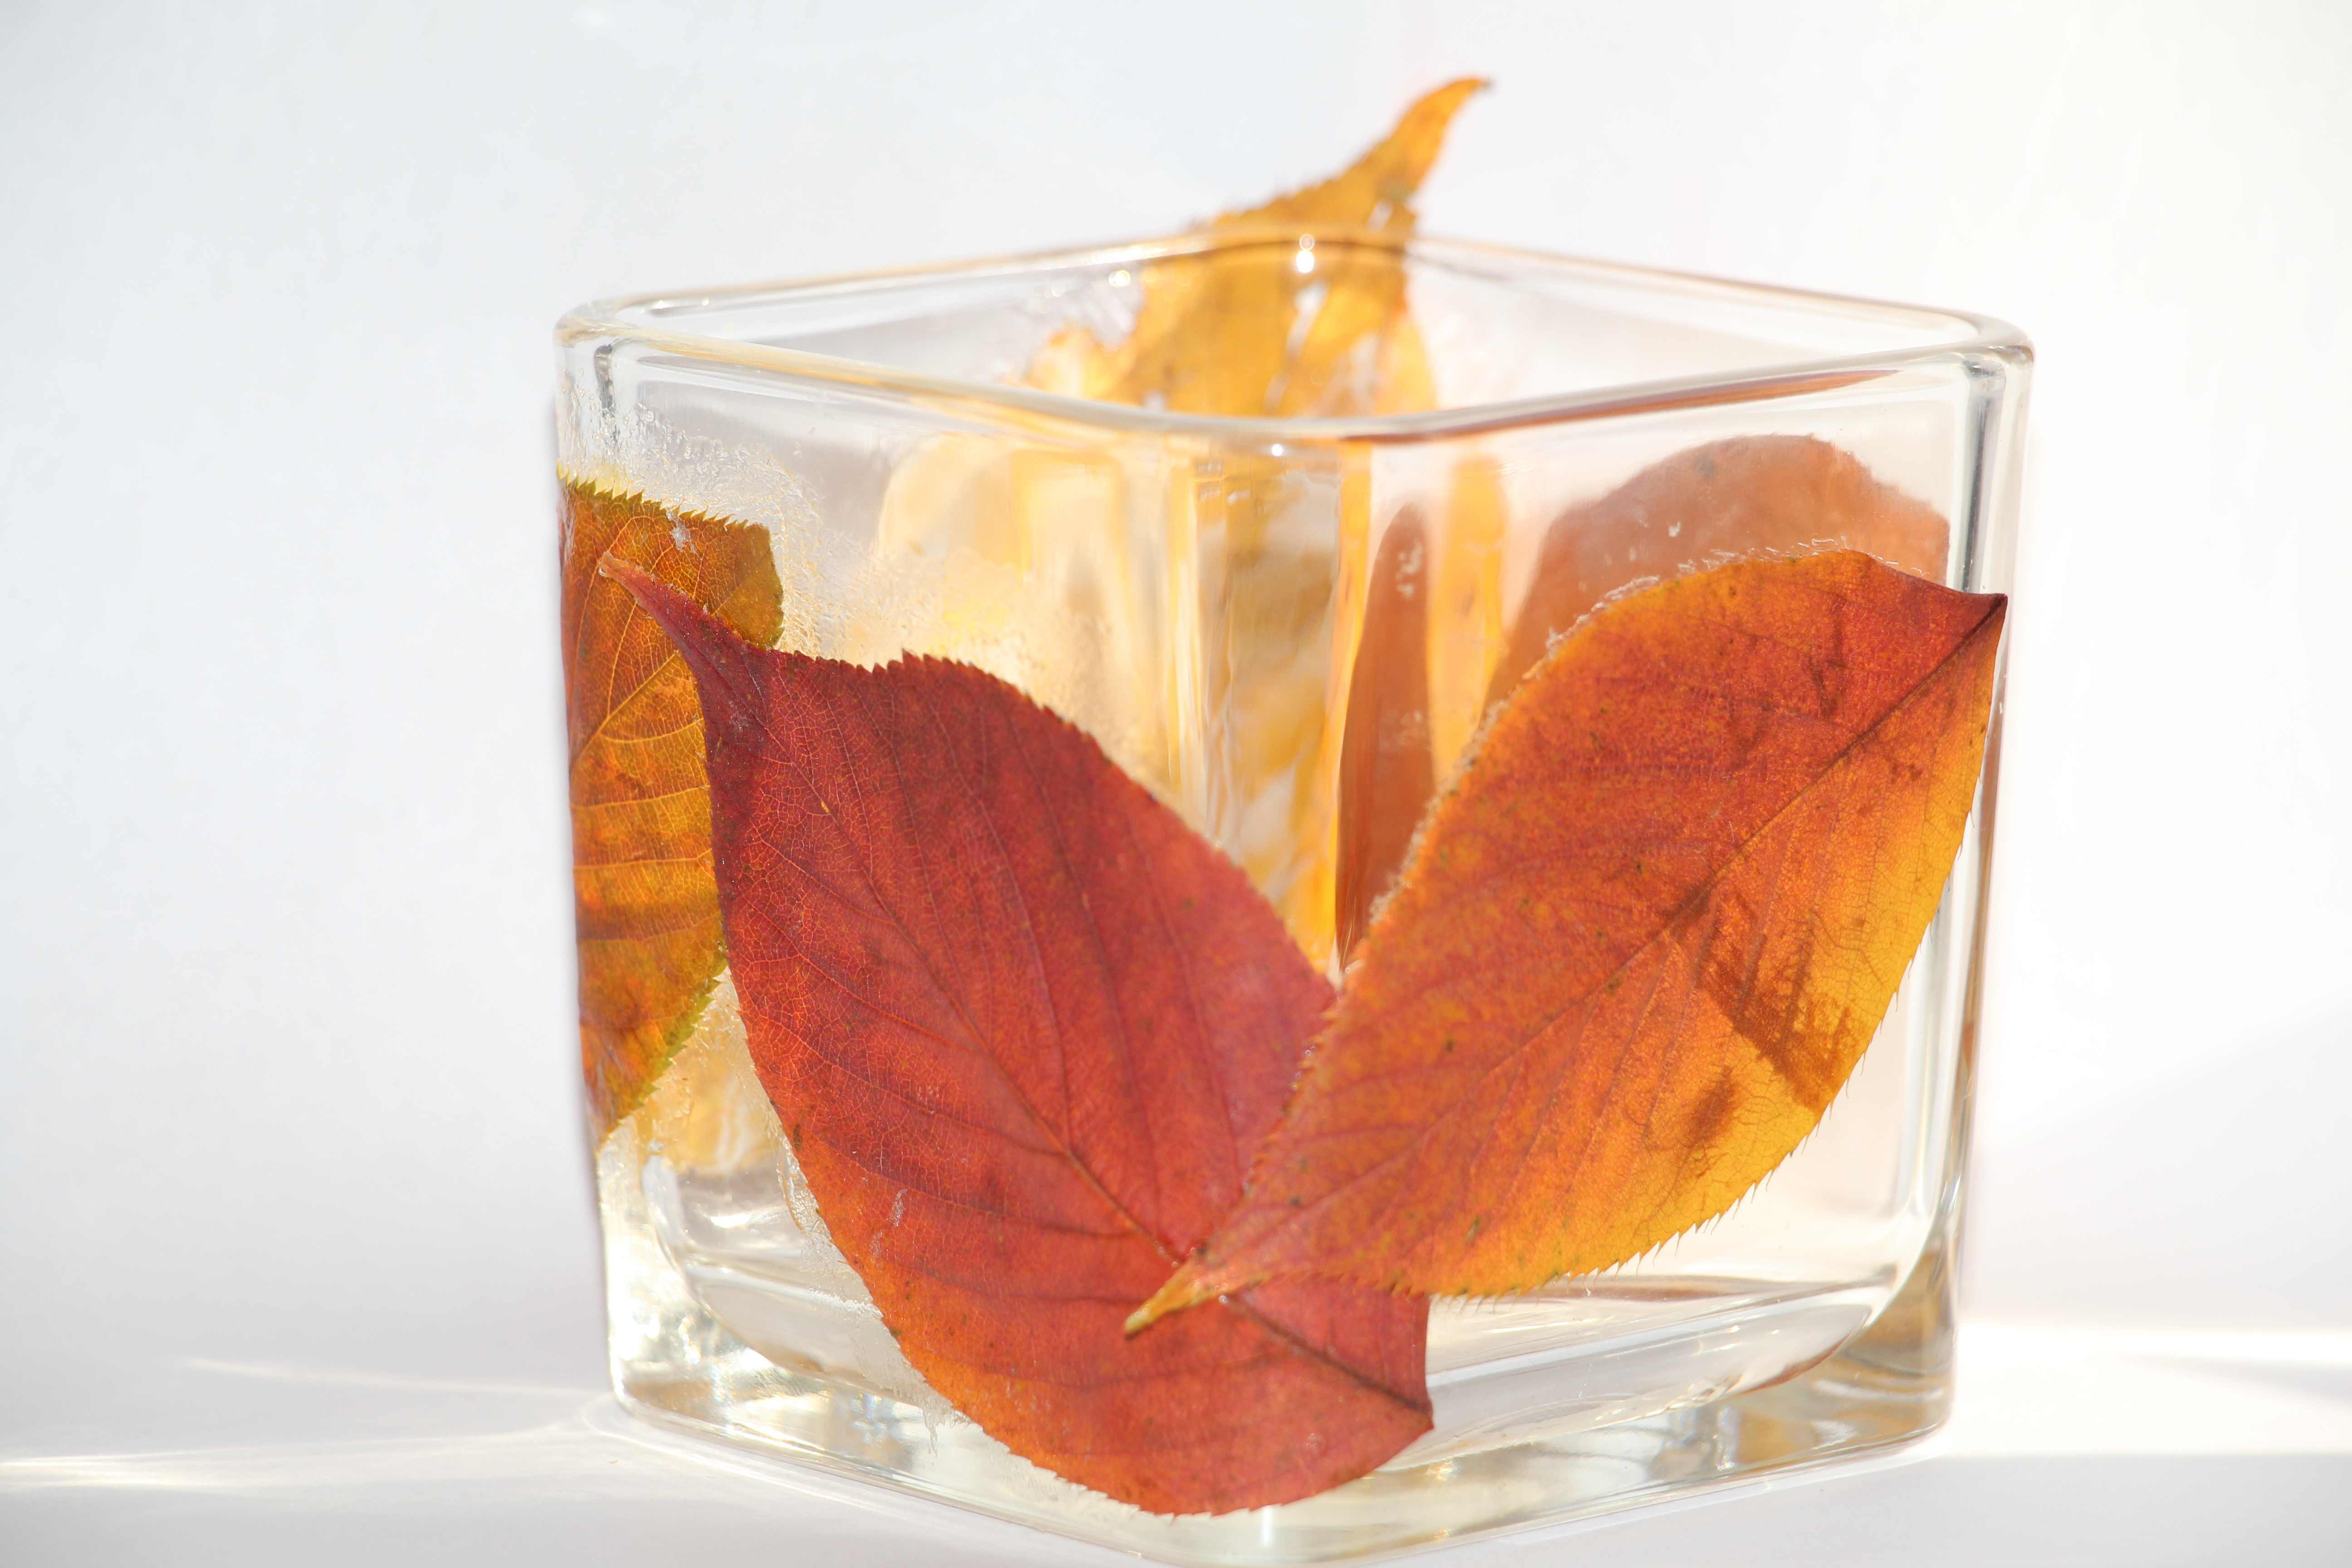 DIY Orange Cinnamon Spice Candle